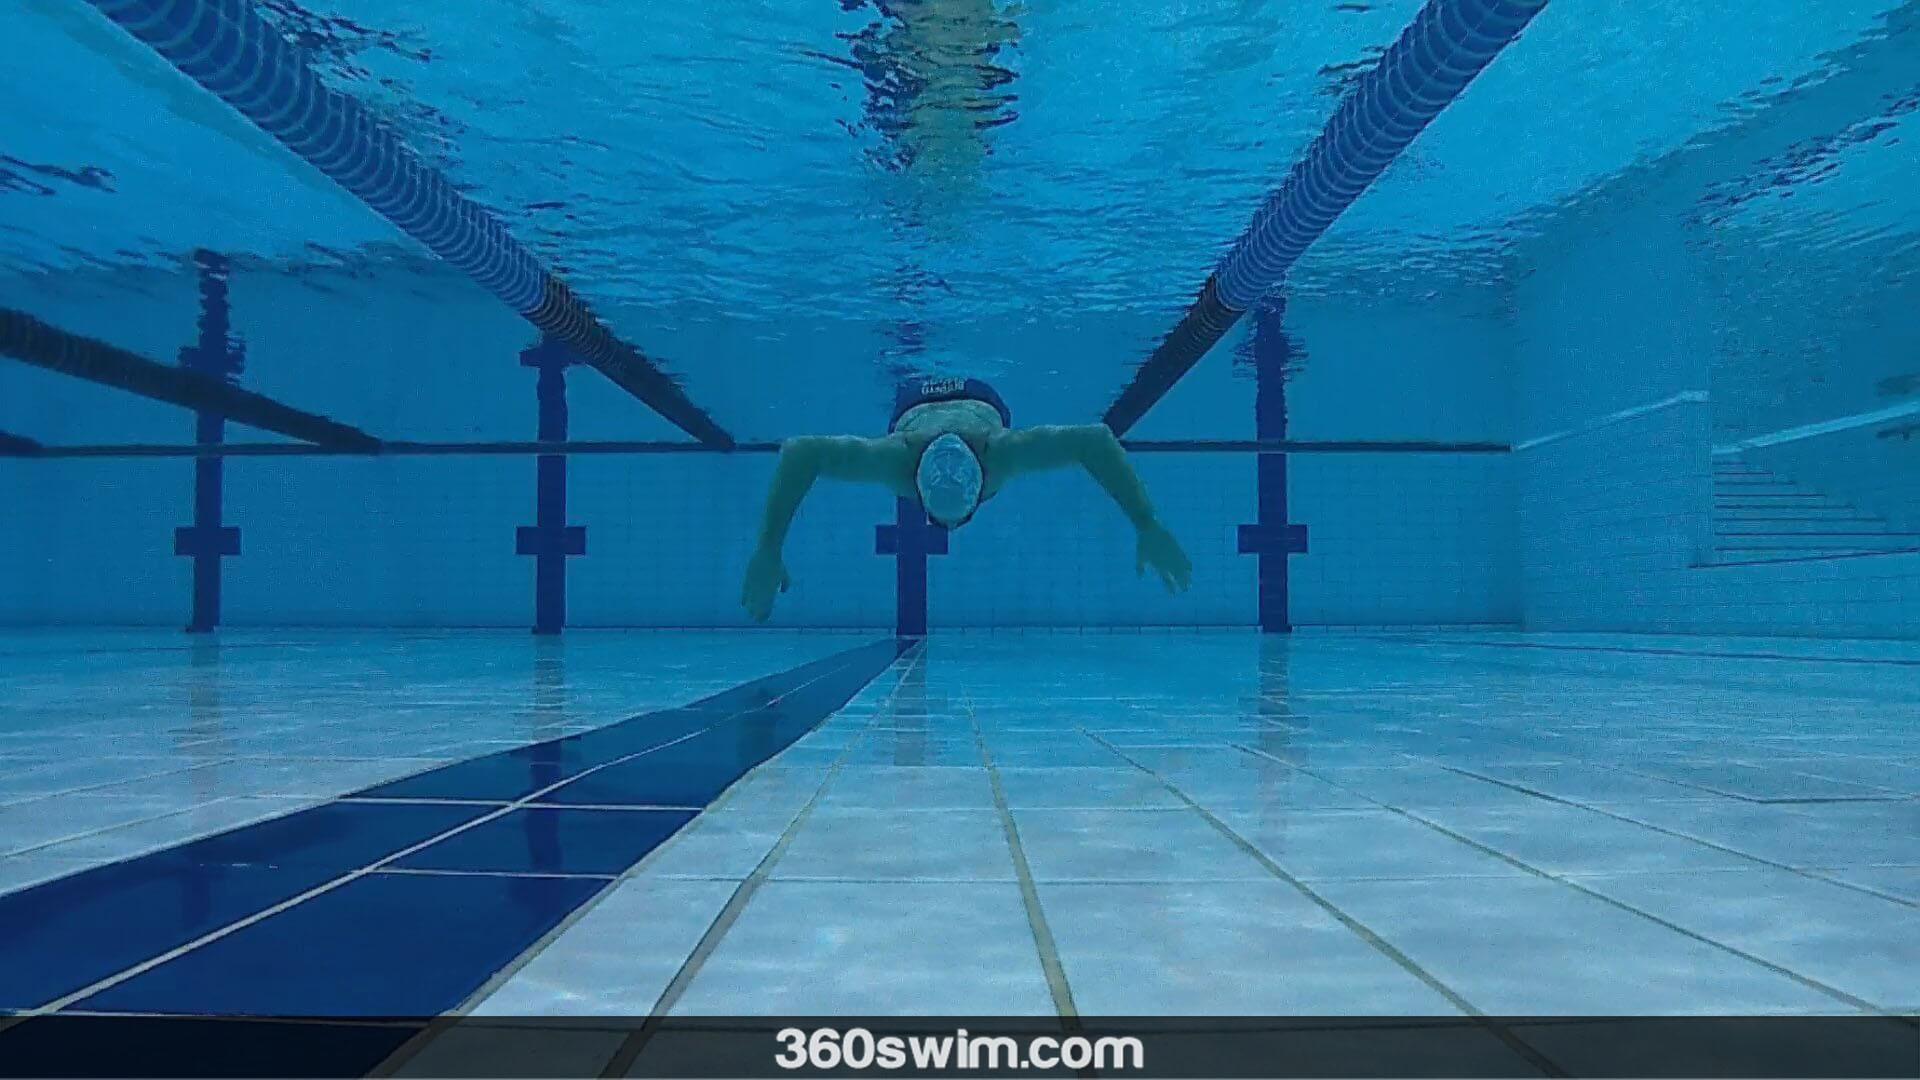 Powerful breaststroke pull